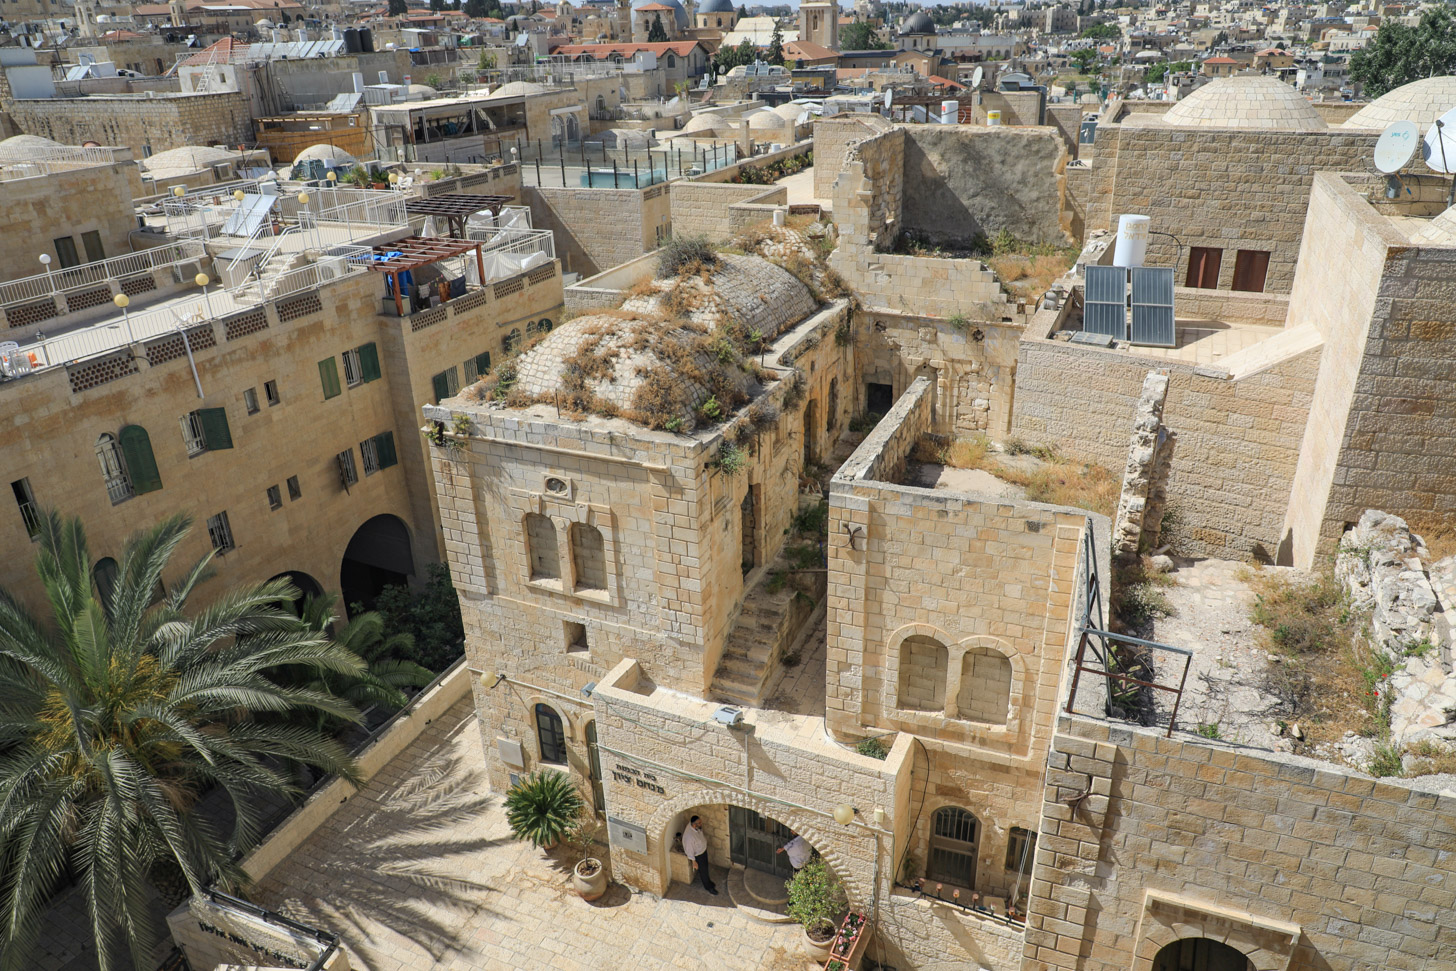 Oude binnenstad van Jeruzalem